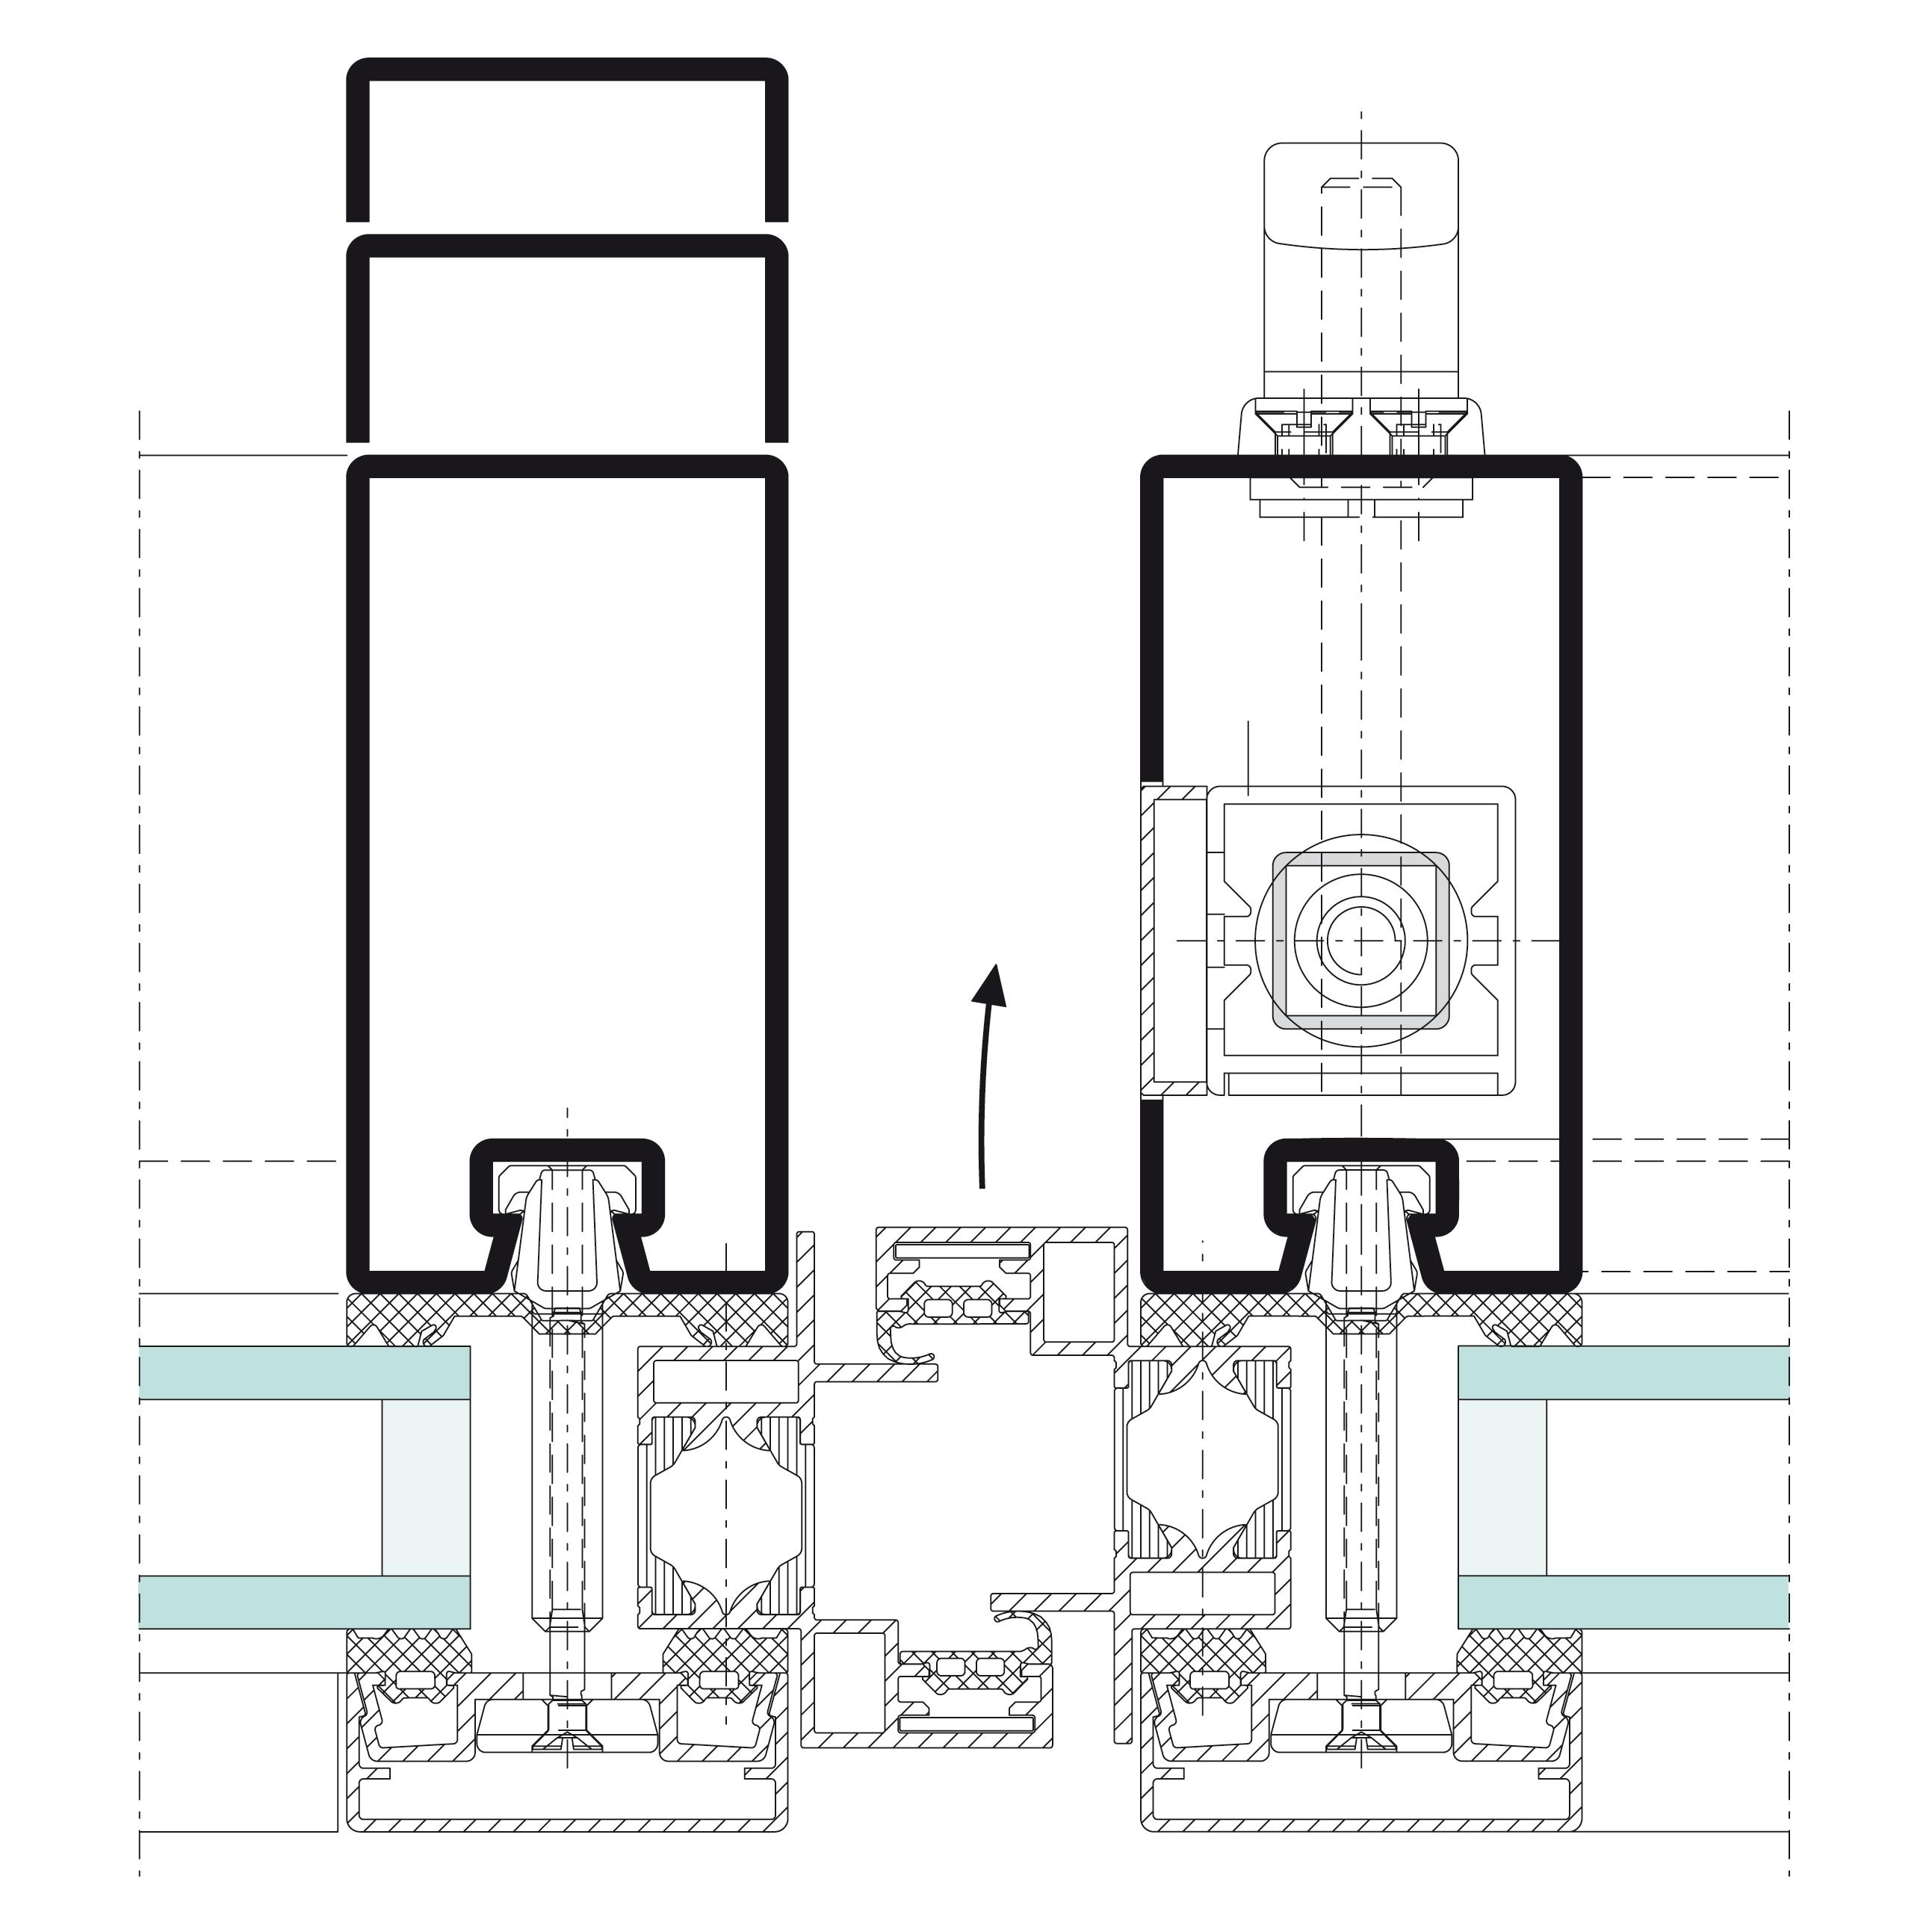 2586x2586 Viss Revolving Doors And Pivot Doors